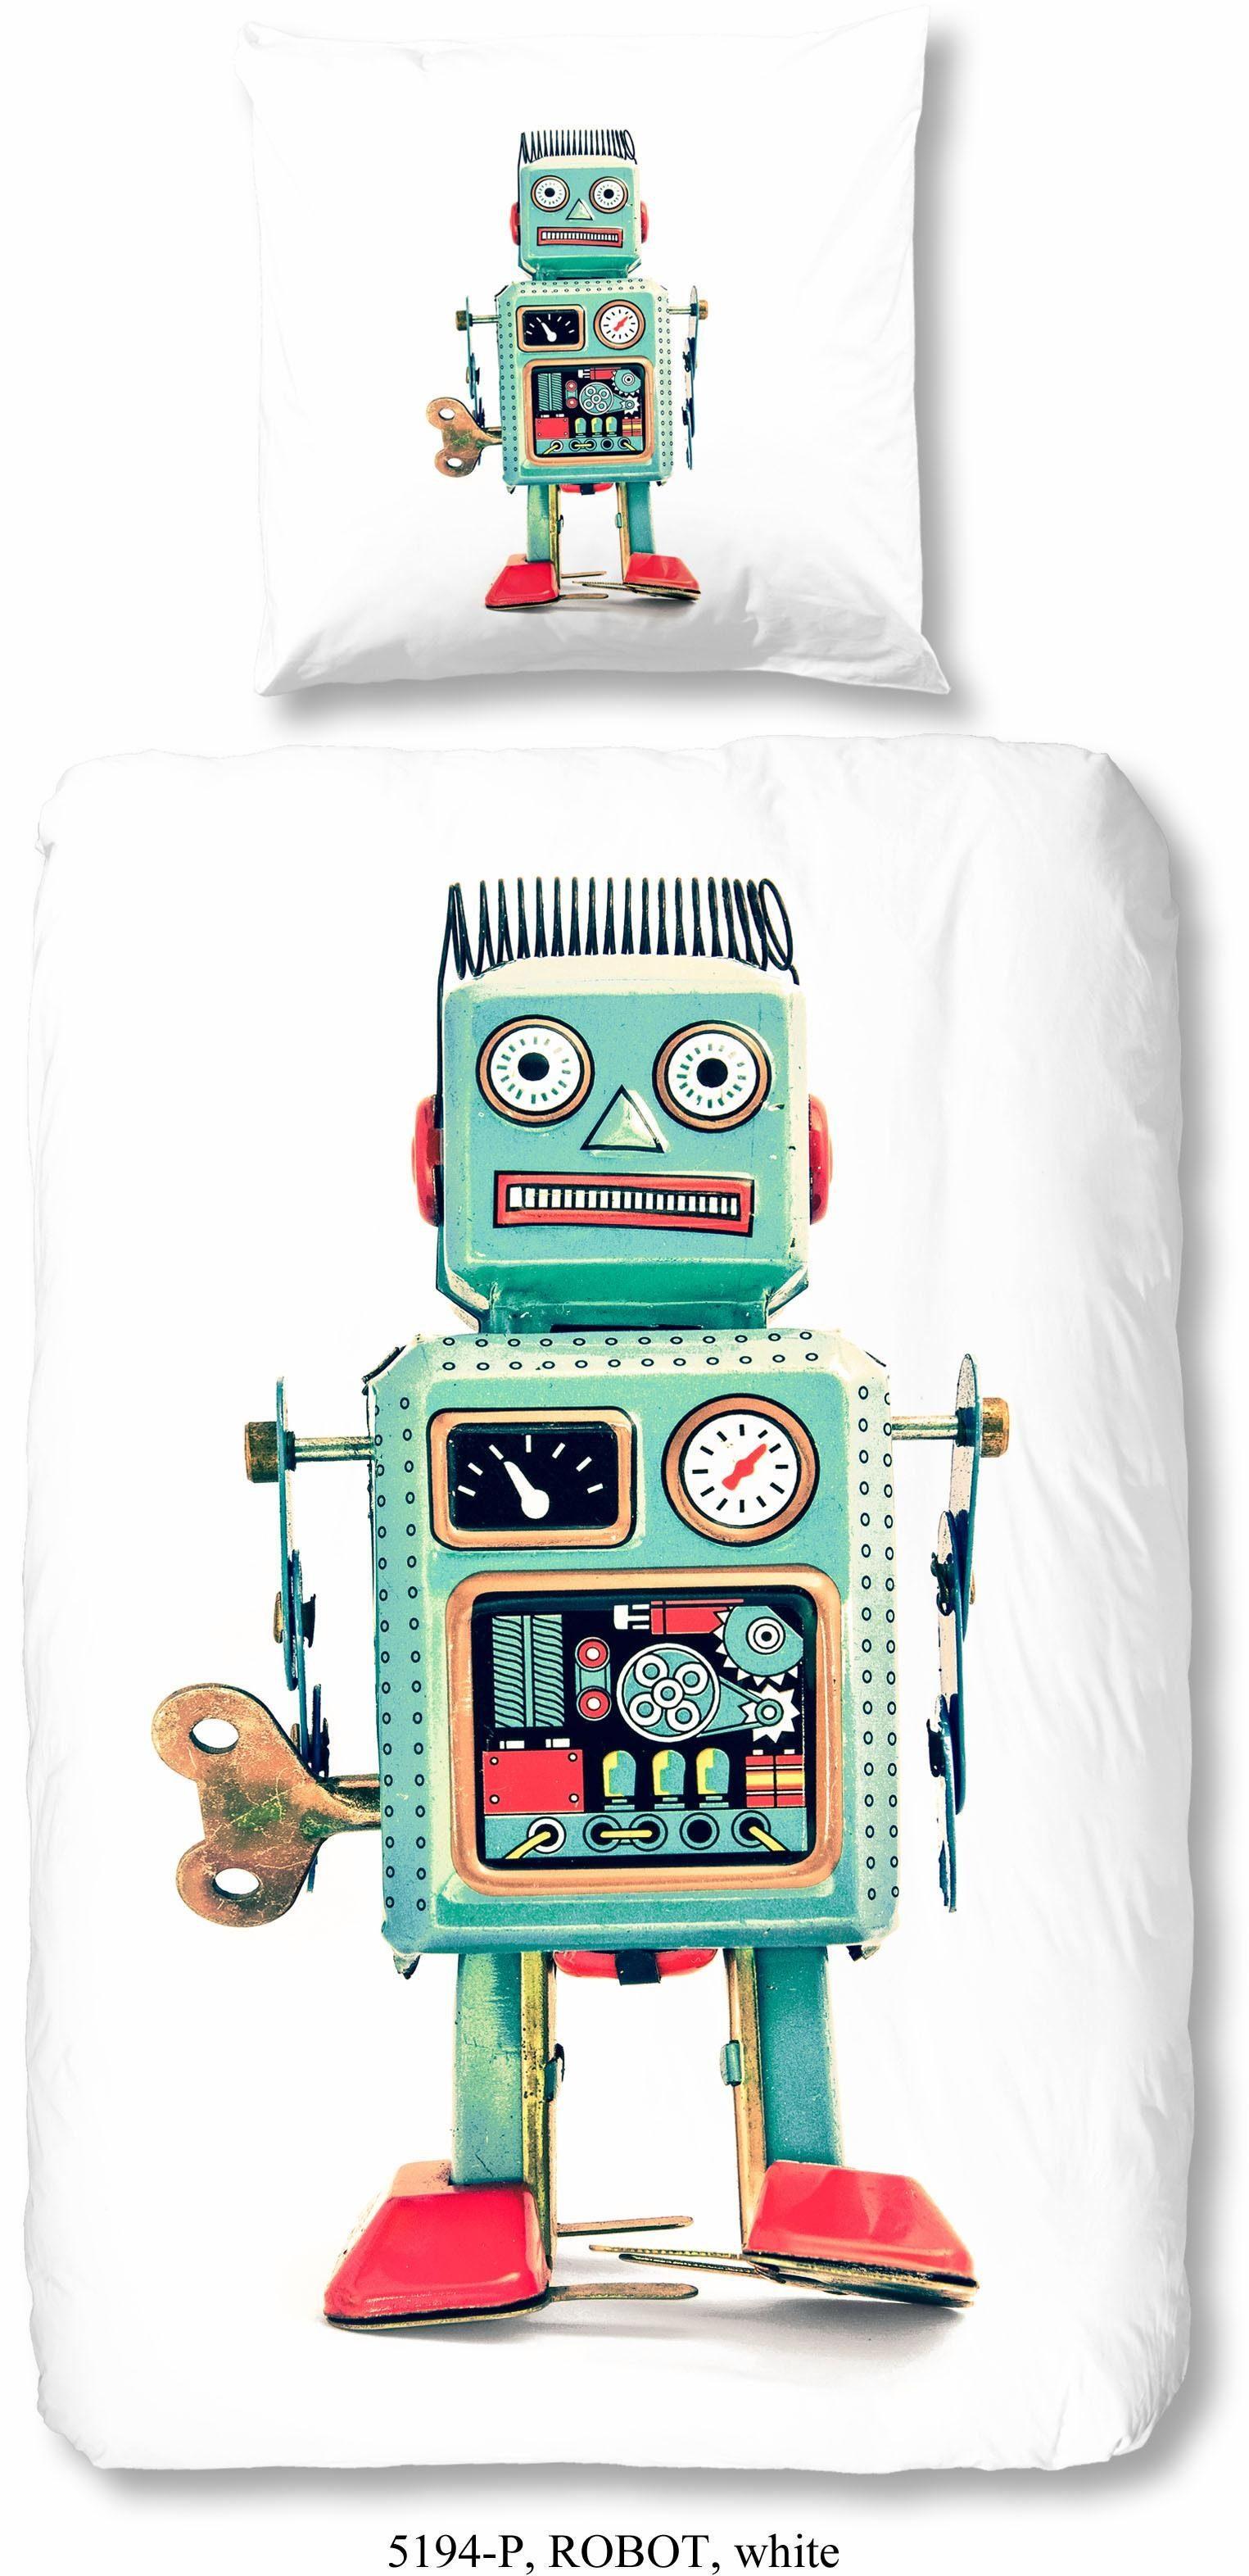 Kinderbettwäsche »Robot«, good morning, mit Robotermotiv